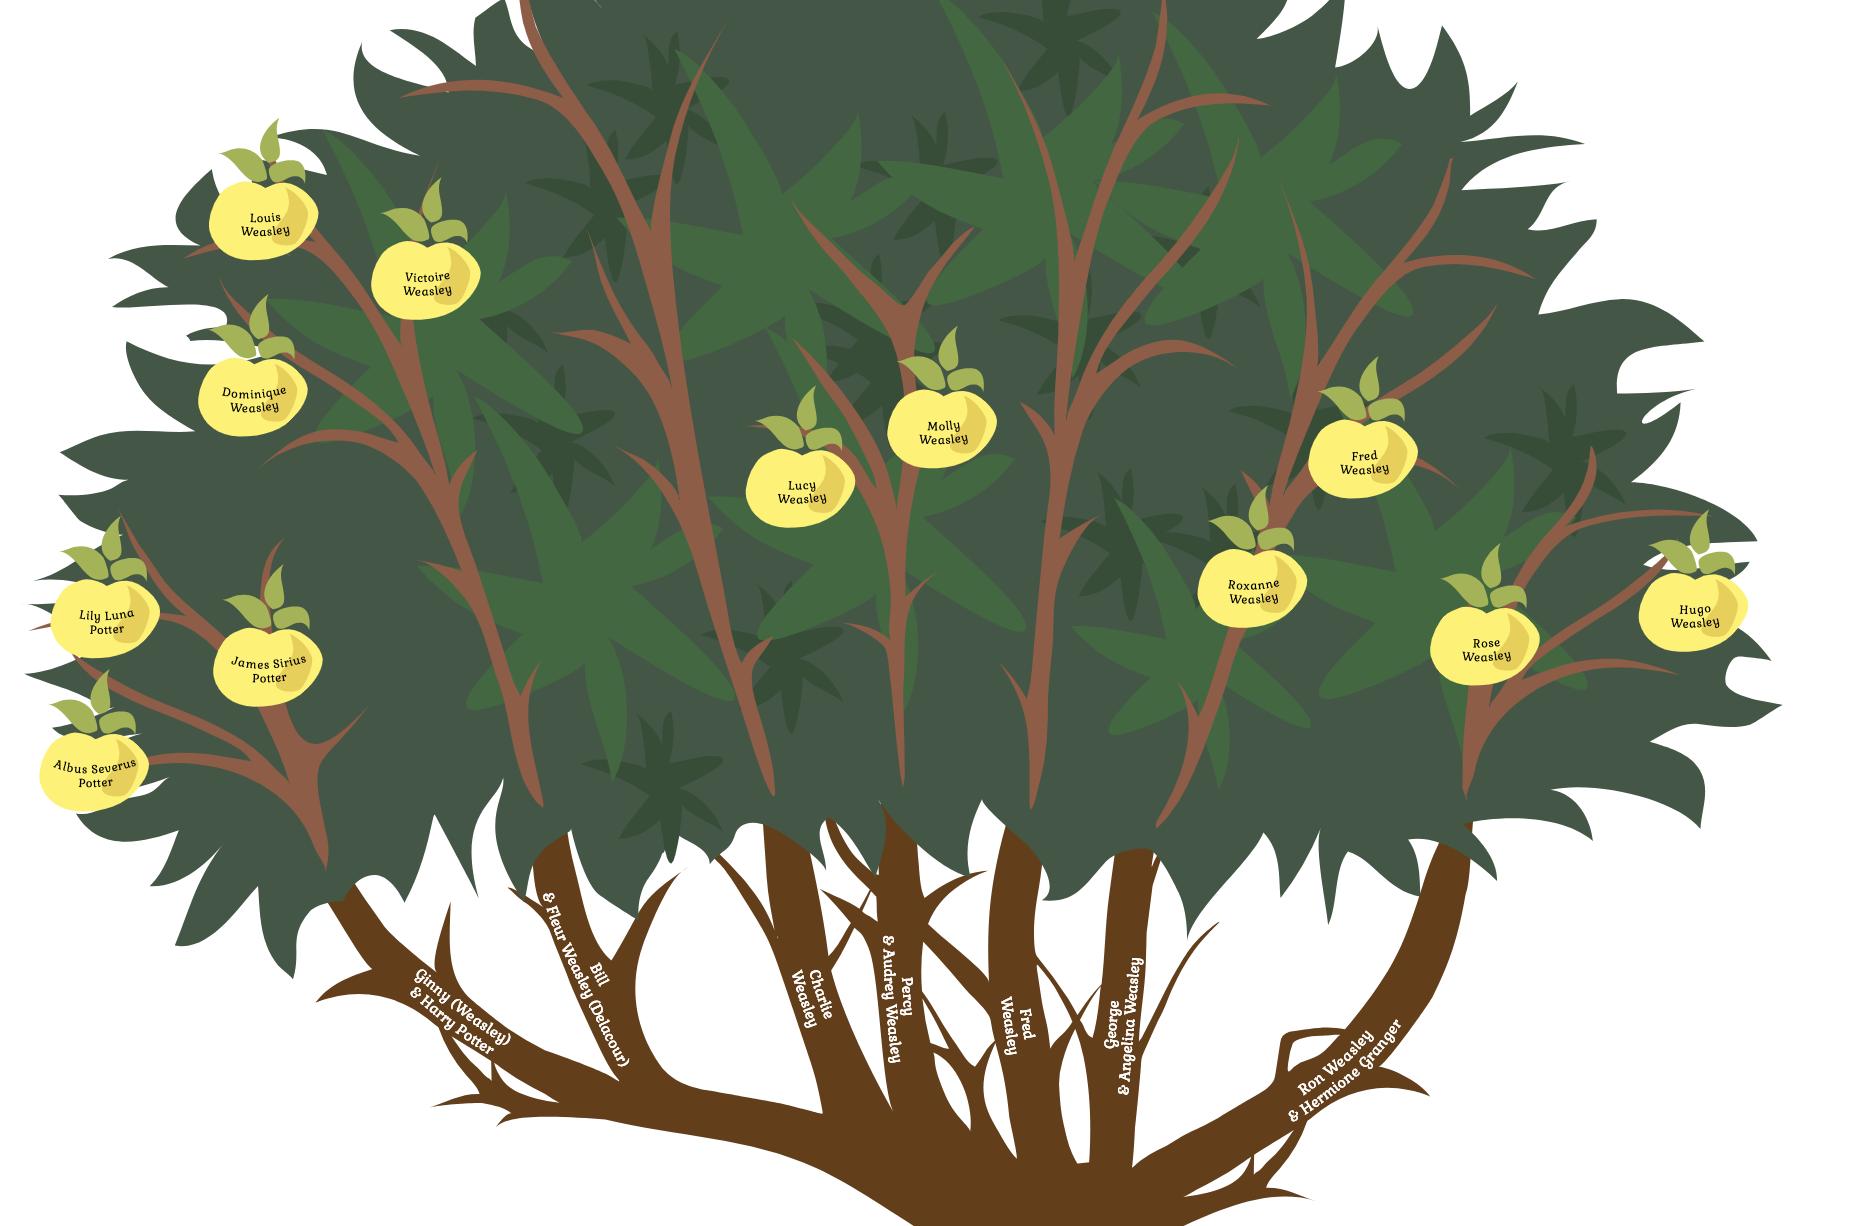 Ron Weasley Family Tree